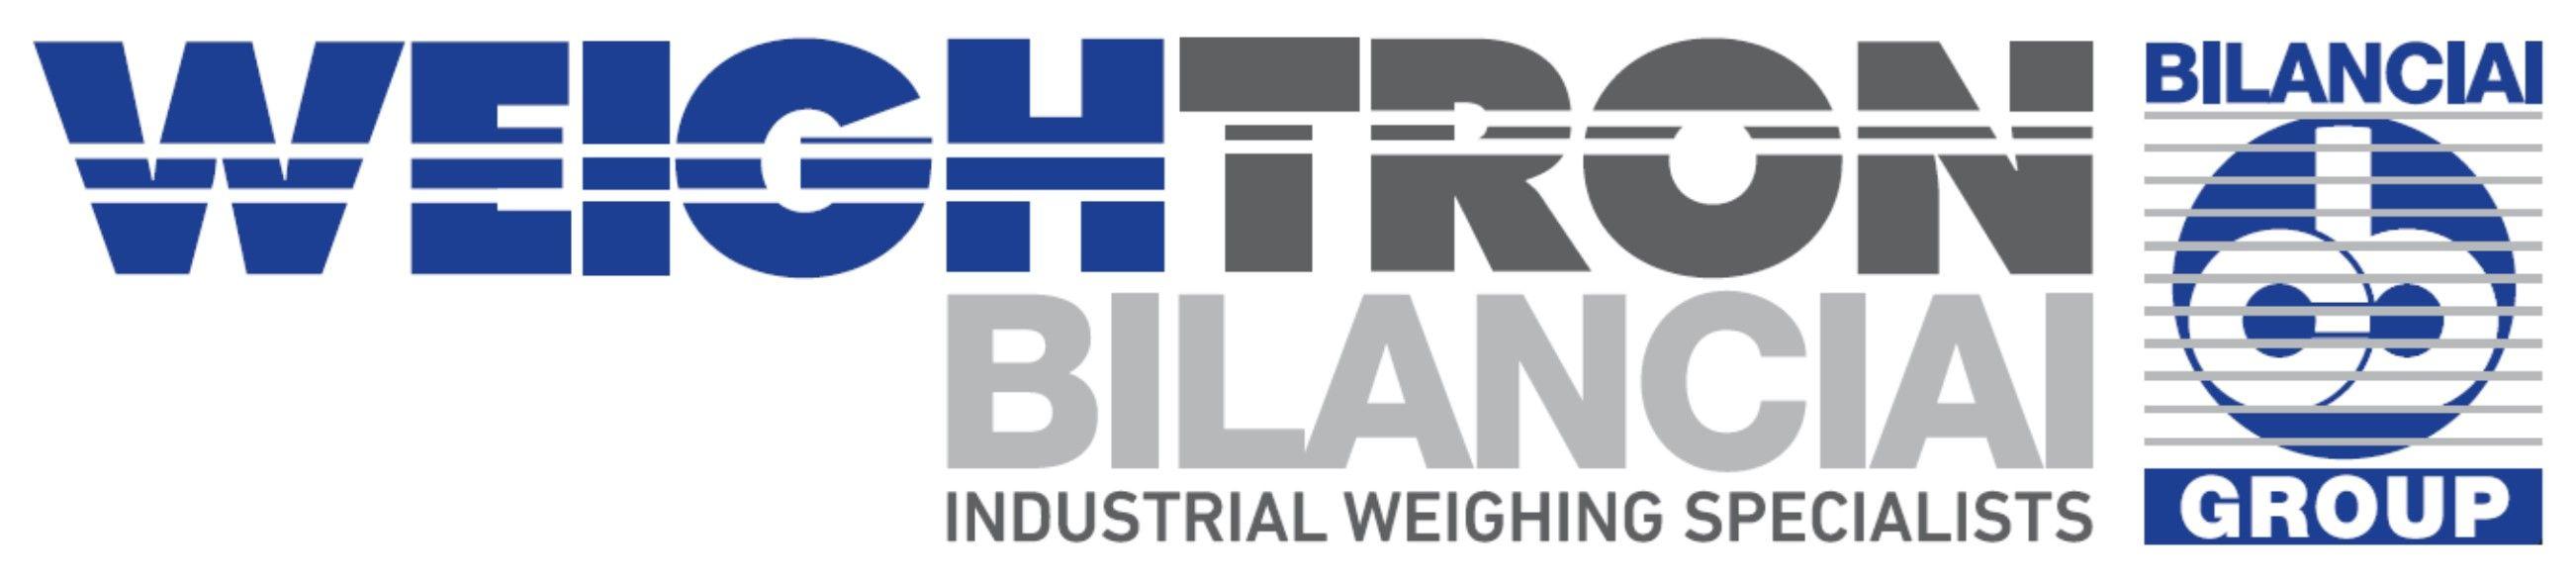 Weightron Bilanciai Ltd